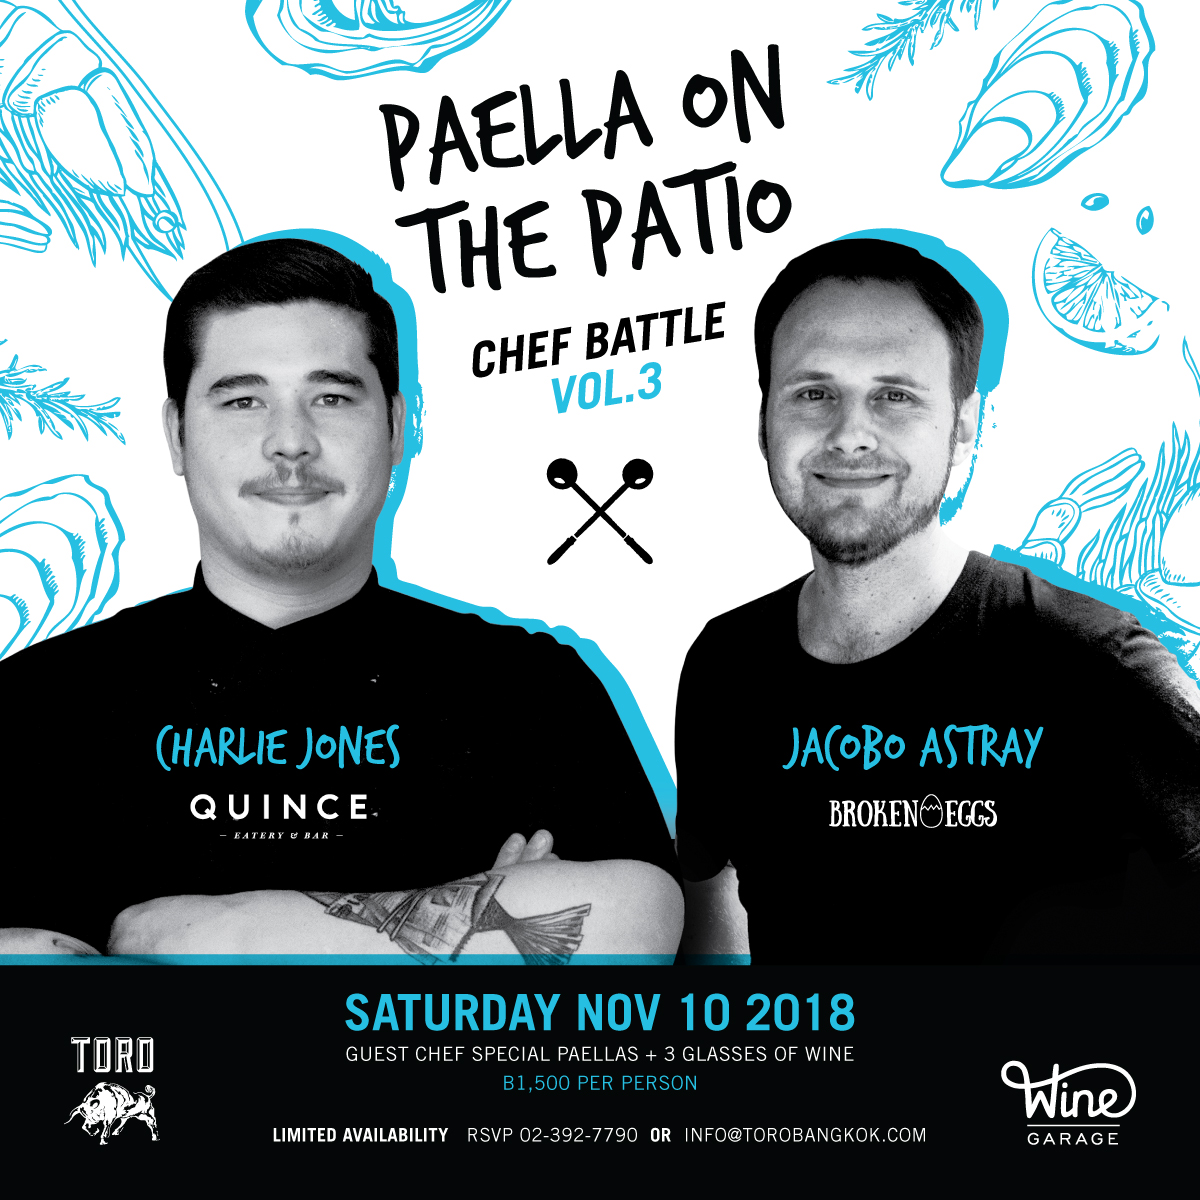 TORO-PAELLA-ON-THE-PATIO-V3_1200x1200px